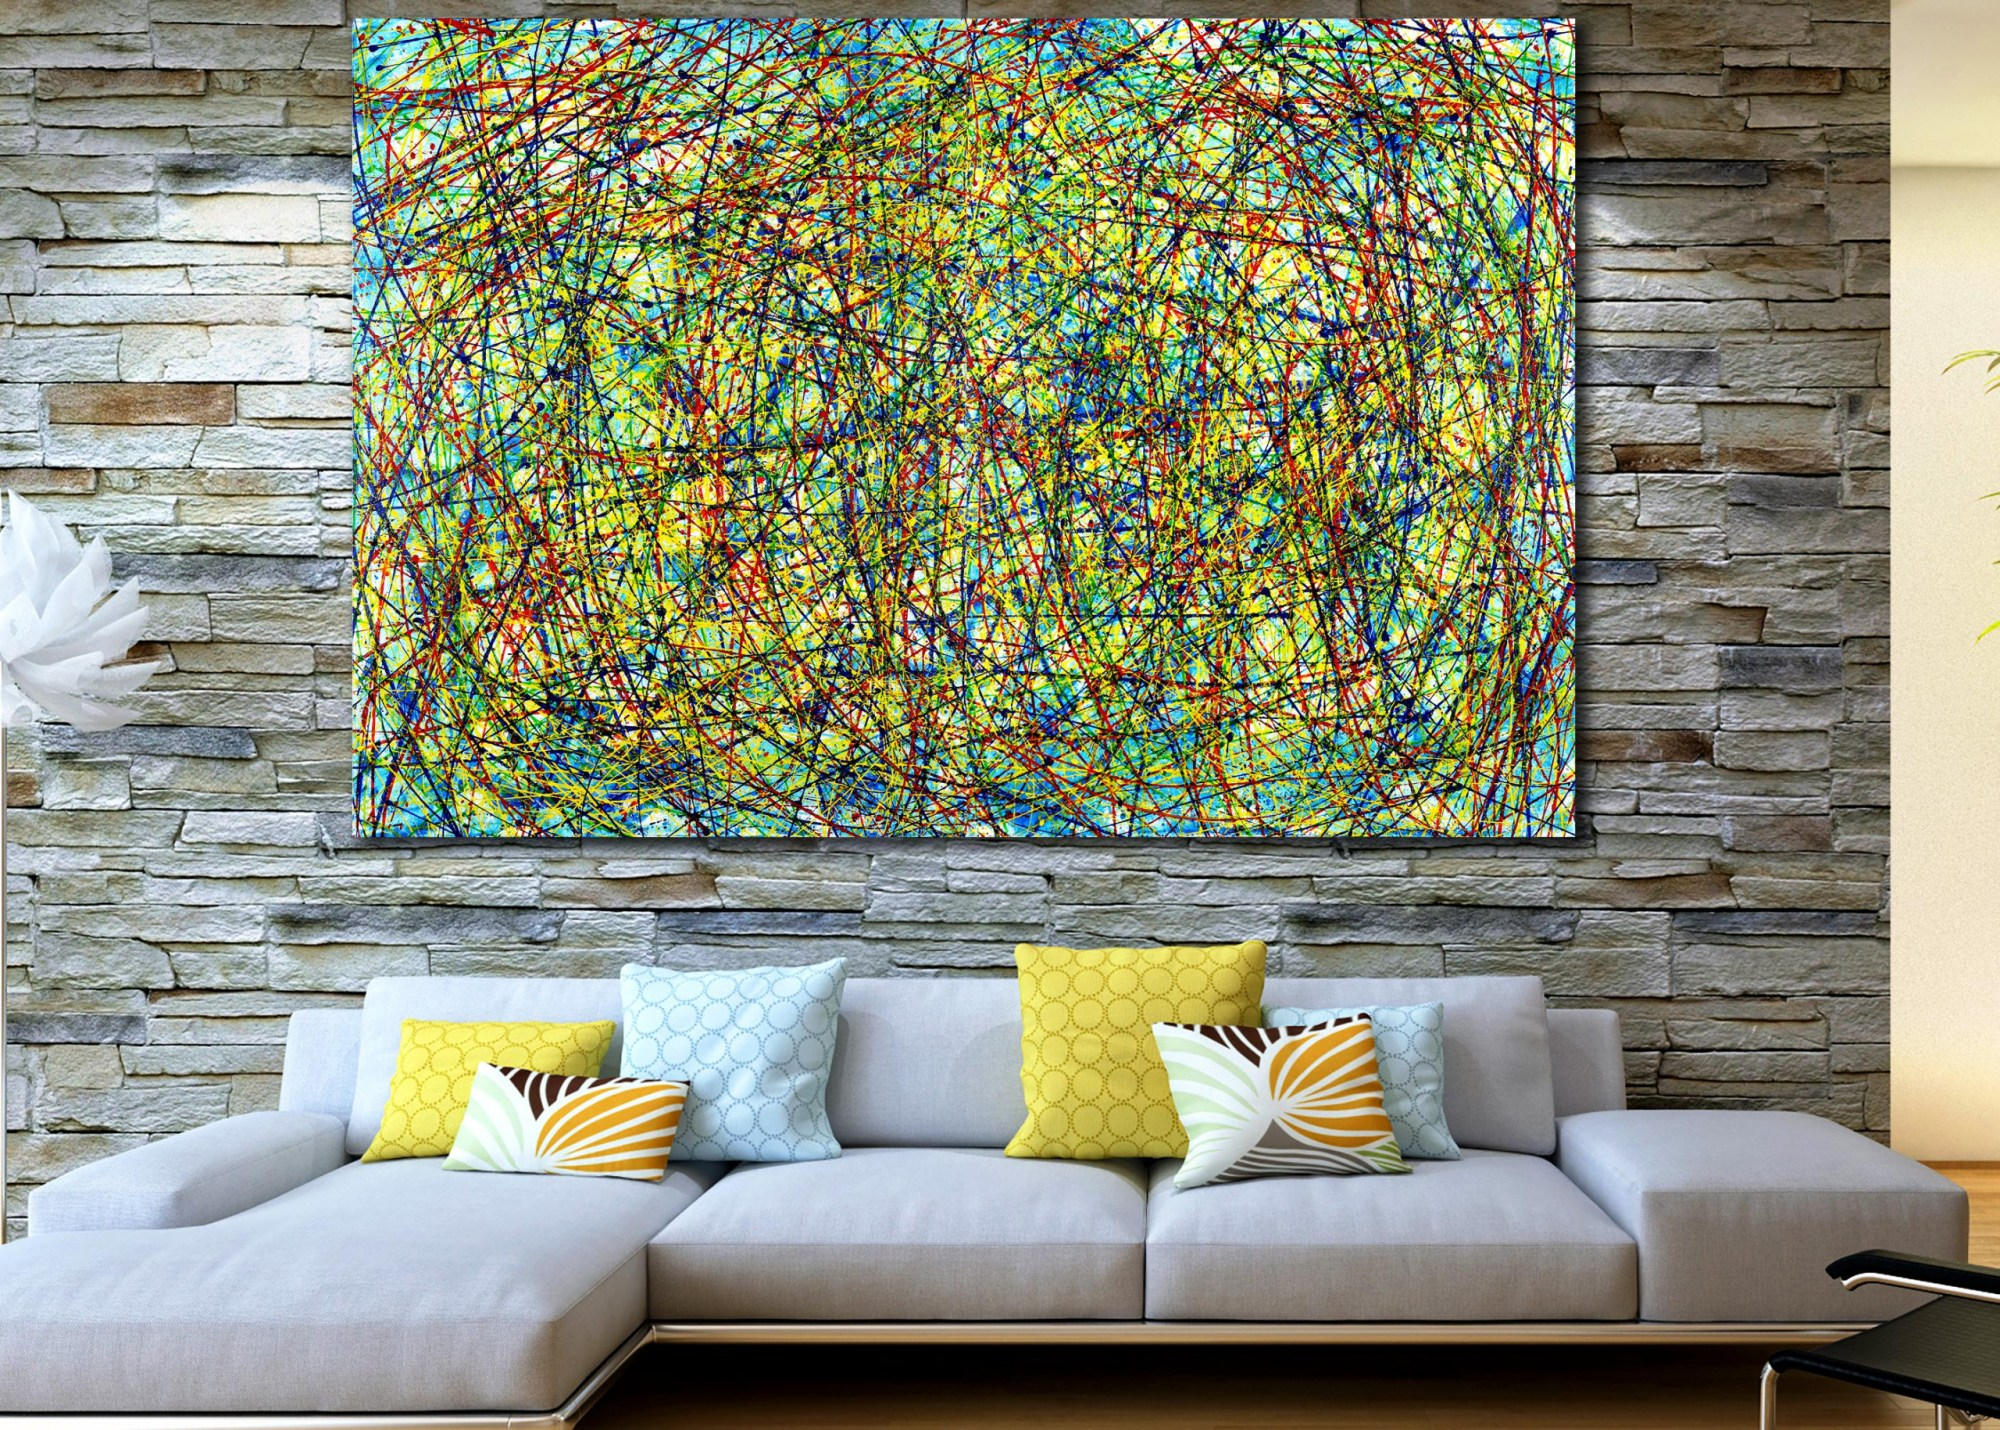 Colorful Display of Affection 1 (2021) / Artist: Nestor Toro